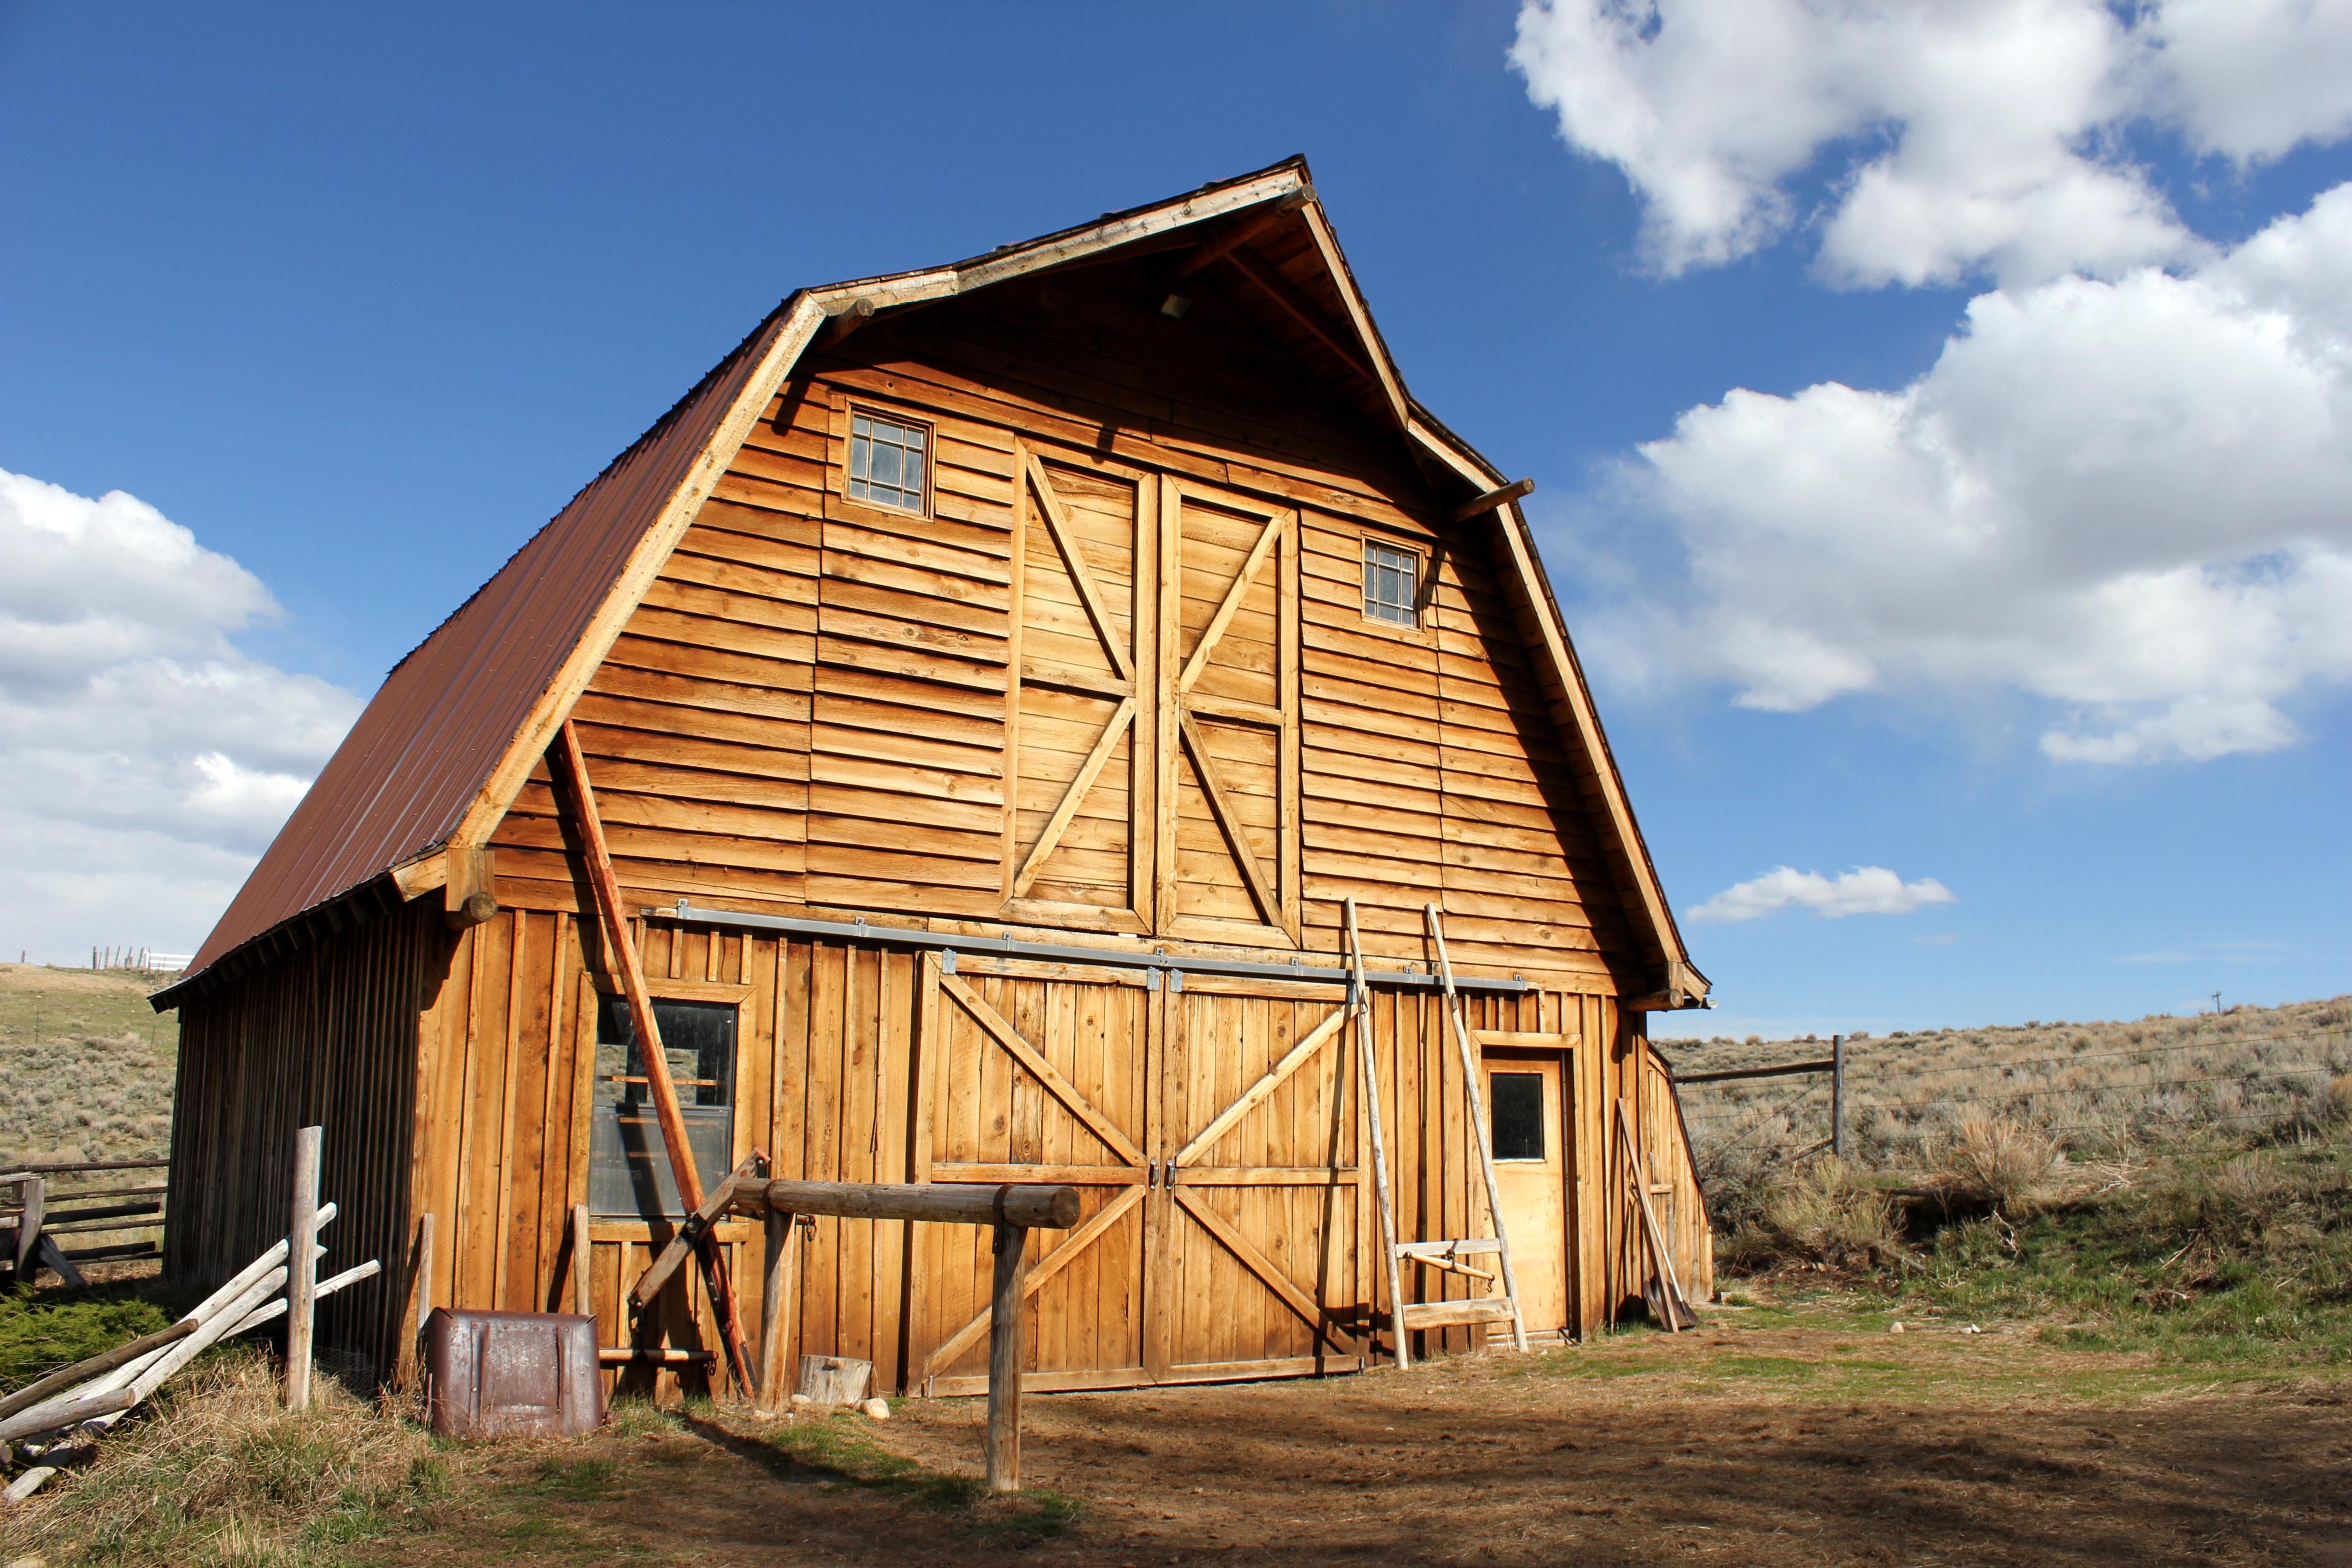 Fotos gratis : granja, edificio, granero, país, cobertizo, choza ...